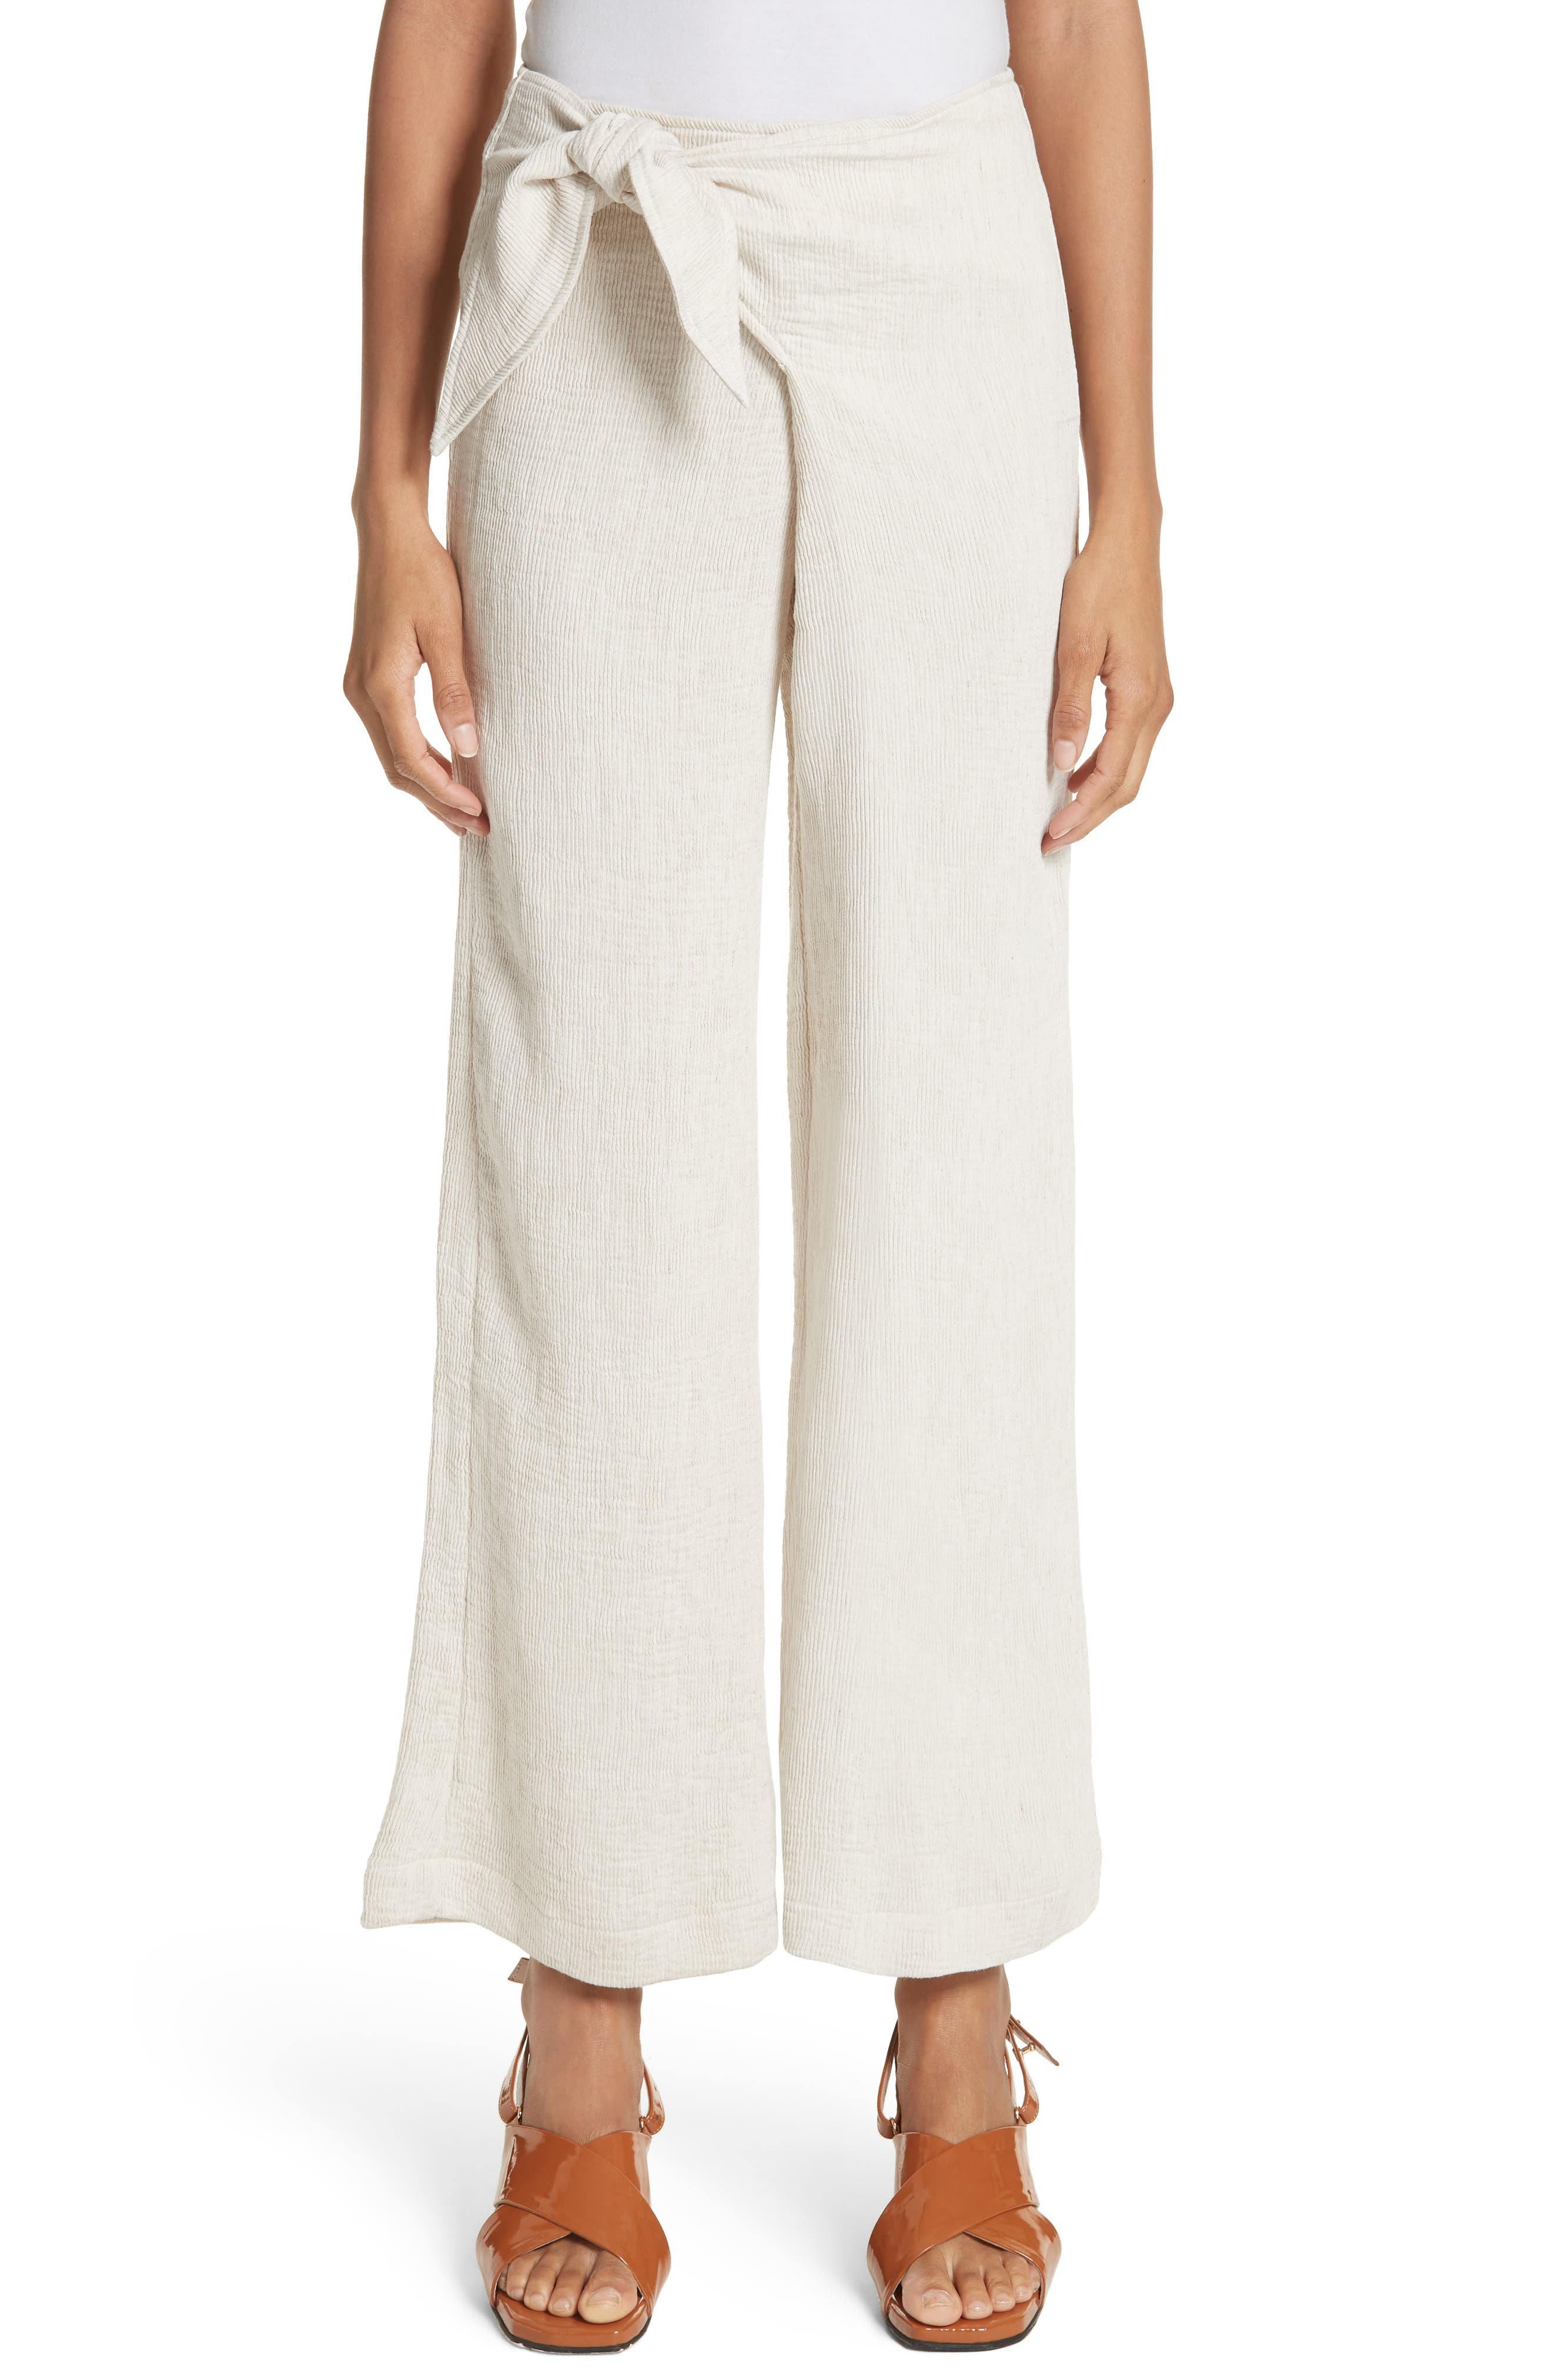 Hatton Drawstring Tie Front Pants,                         Main,                         color, 900